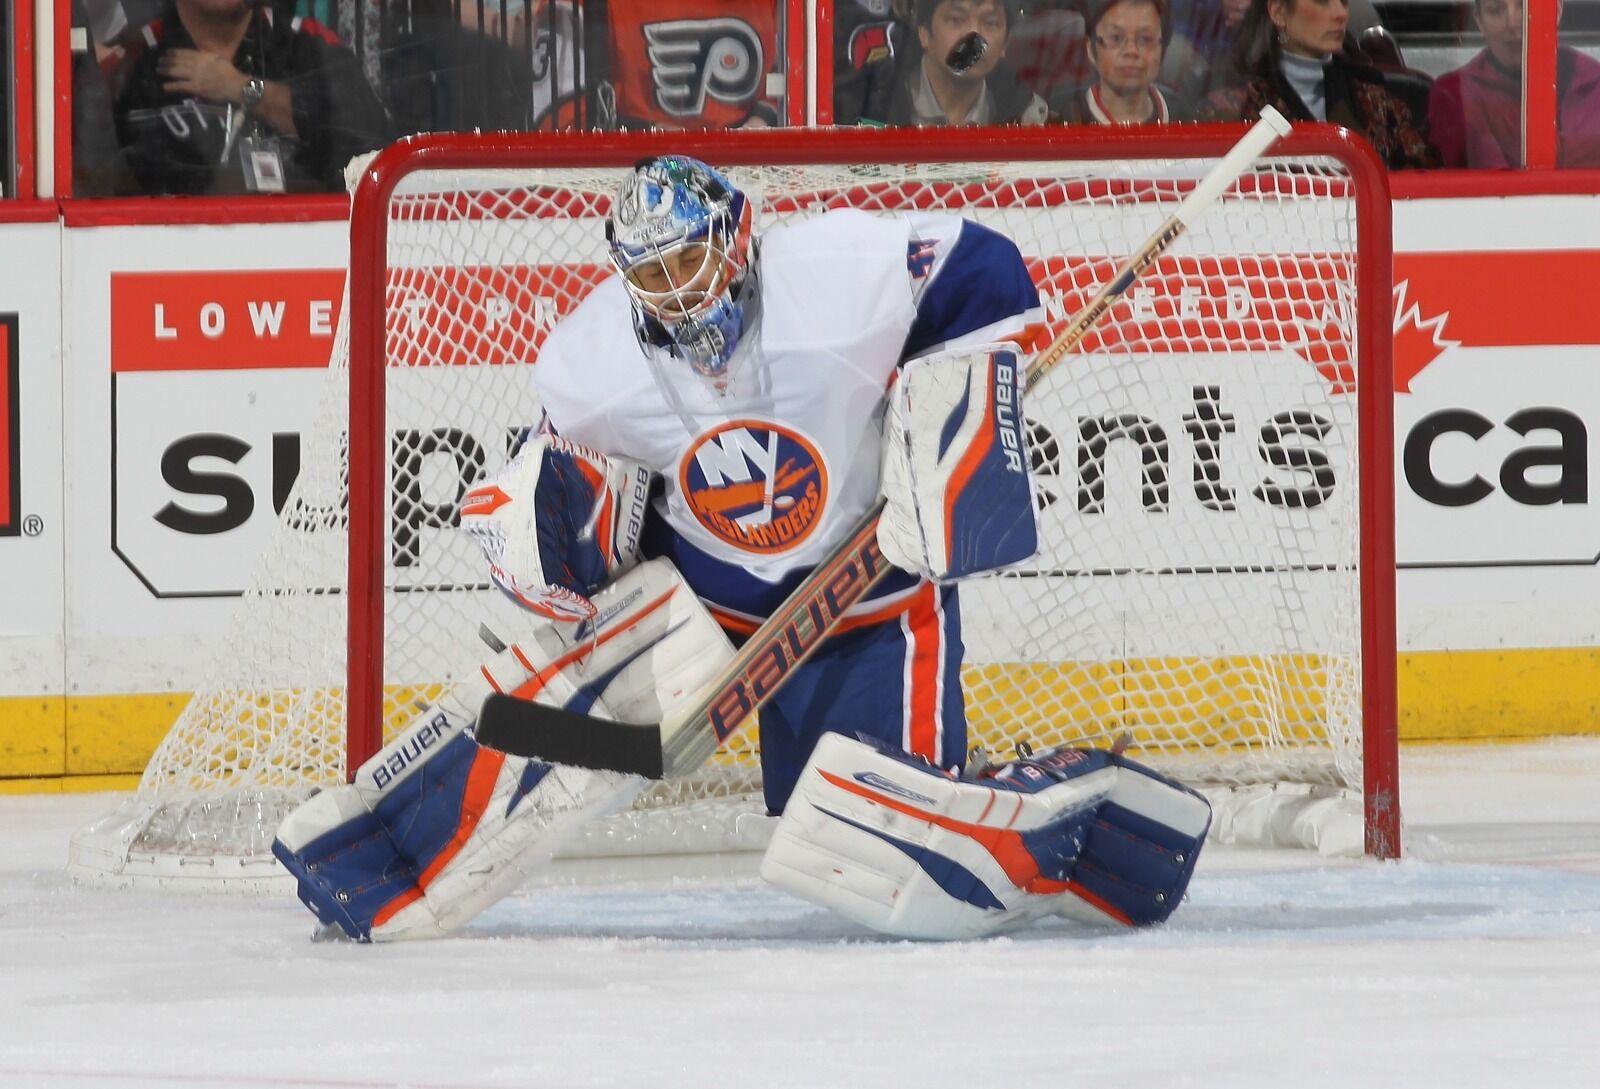 New York Islanders: An interview with former goalie Rick DiPietro